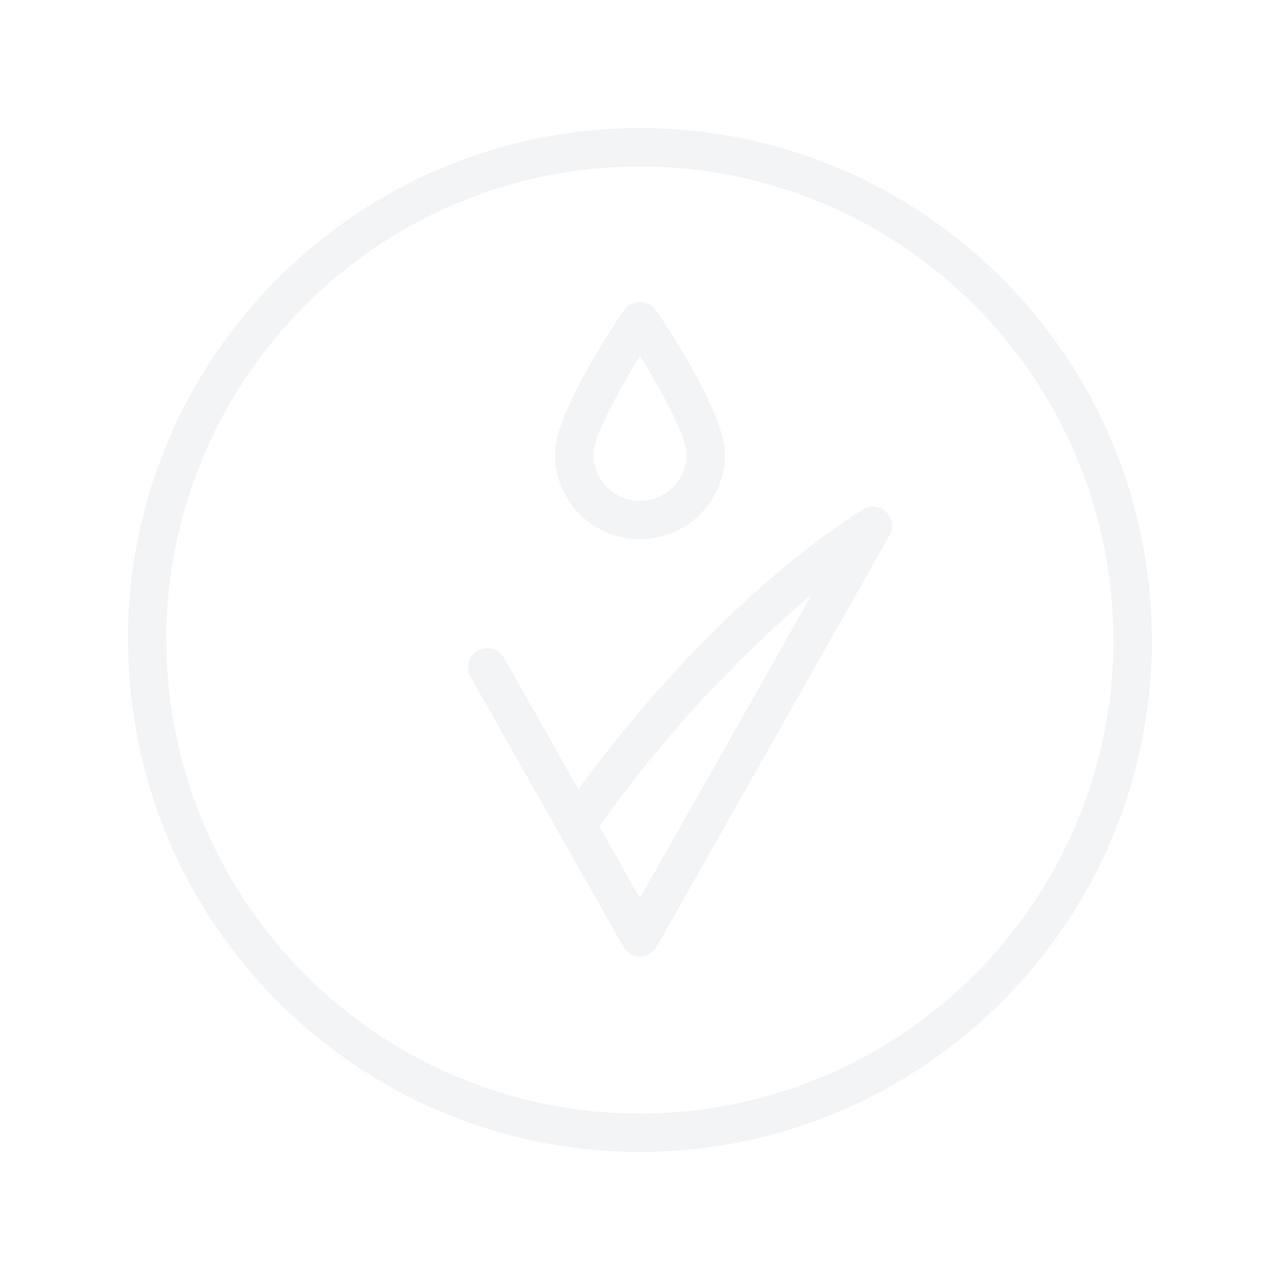 YVES SAINT LAURENT Couture Palette No.13 Nude Contouring 5g